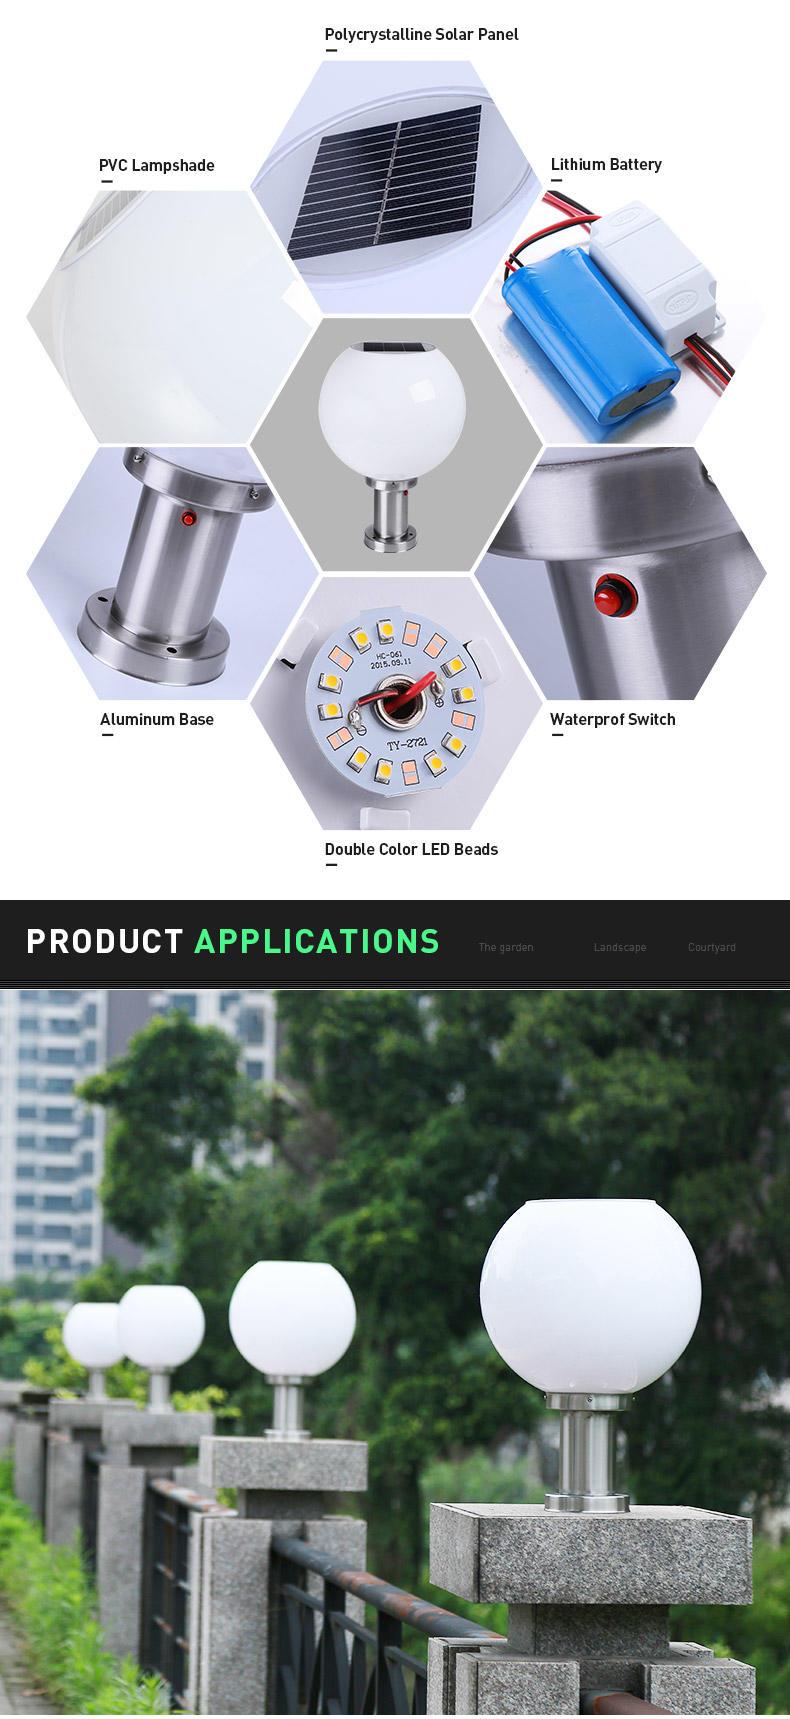 Pat Hei Gate Hardware sharp solar panels factory for sale-3